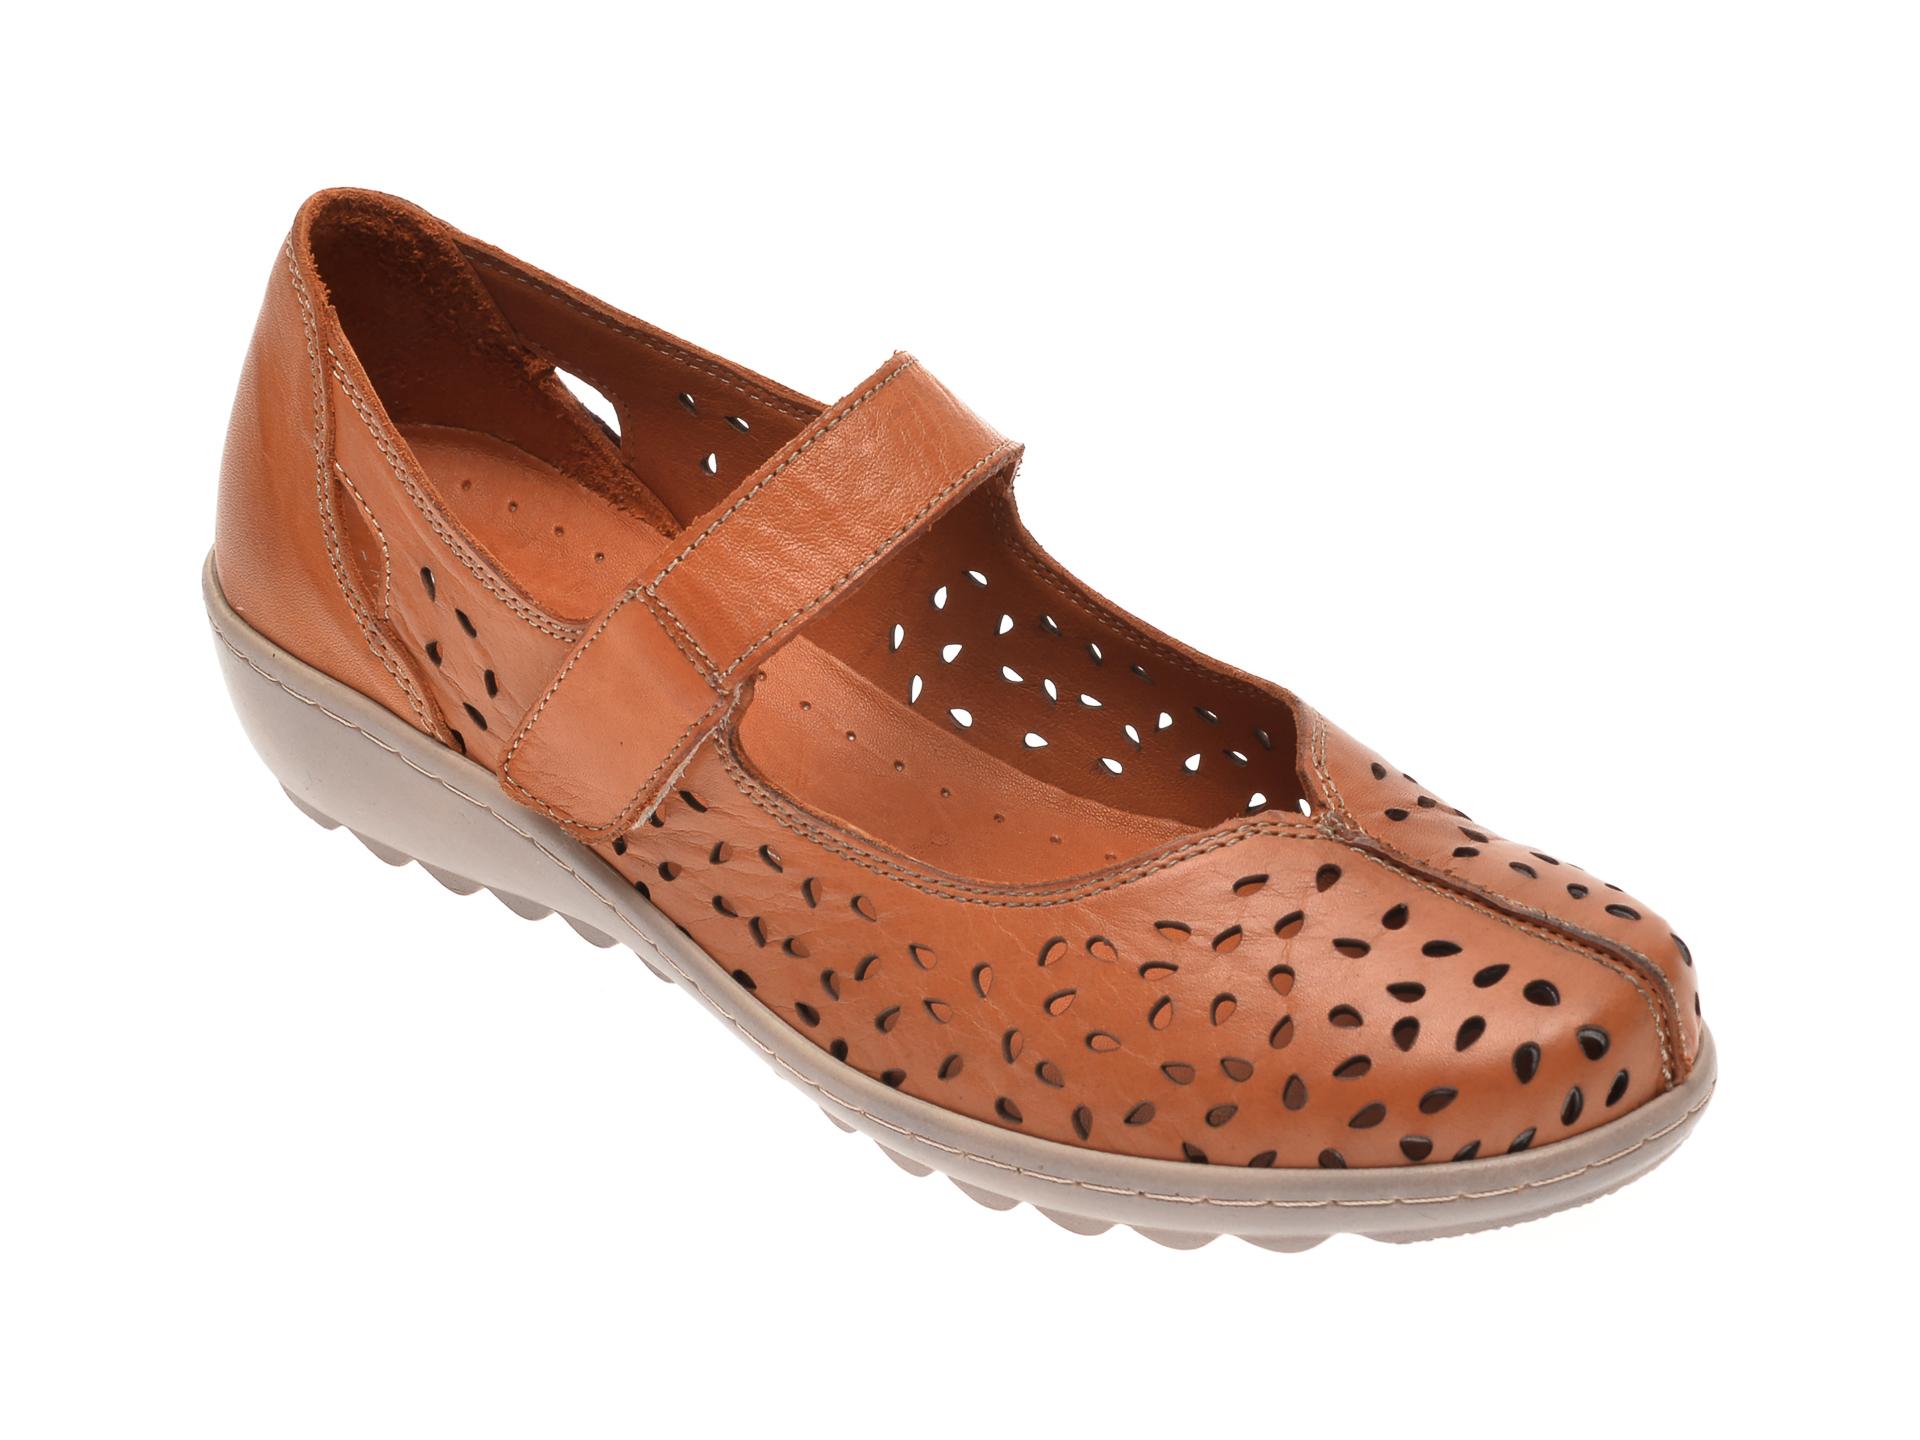 Pantofi LUMEL maro, 203, din piele naturala